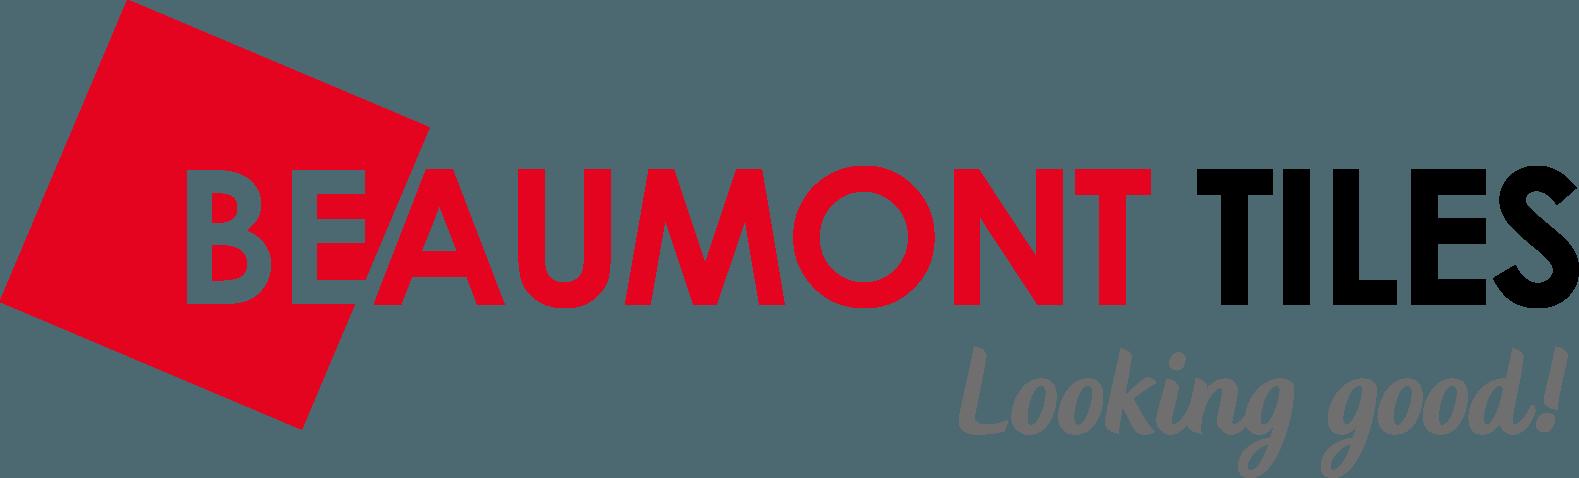 Beaumont Tiles Looking Good_Logo_CMYK-1 (2)